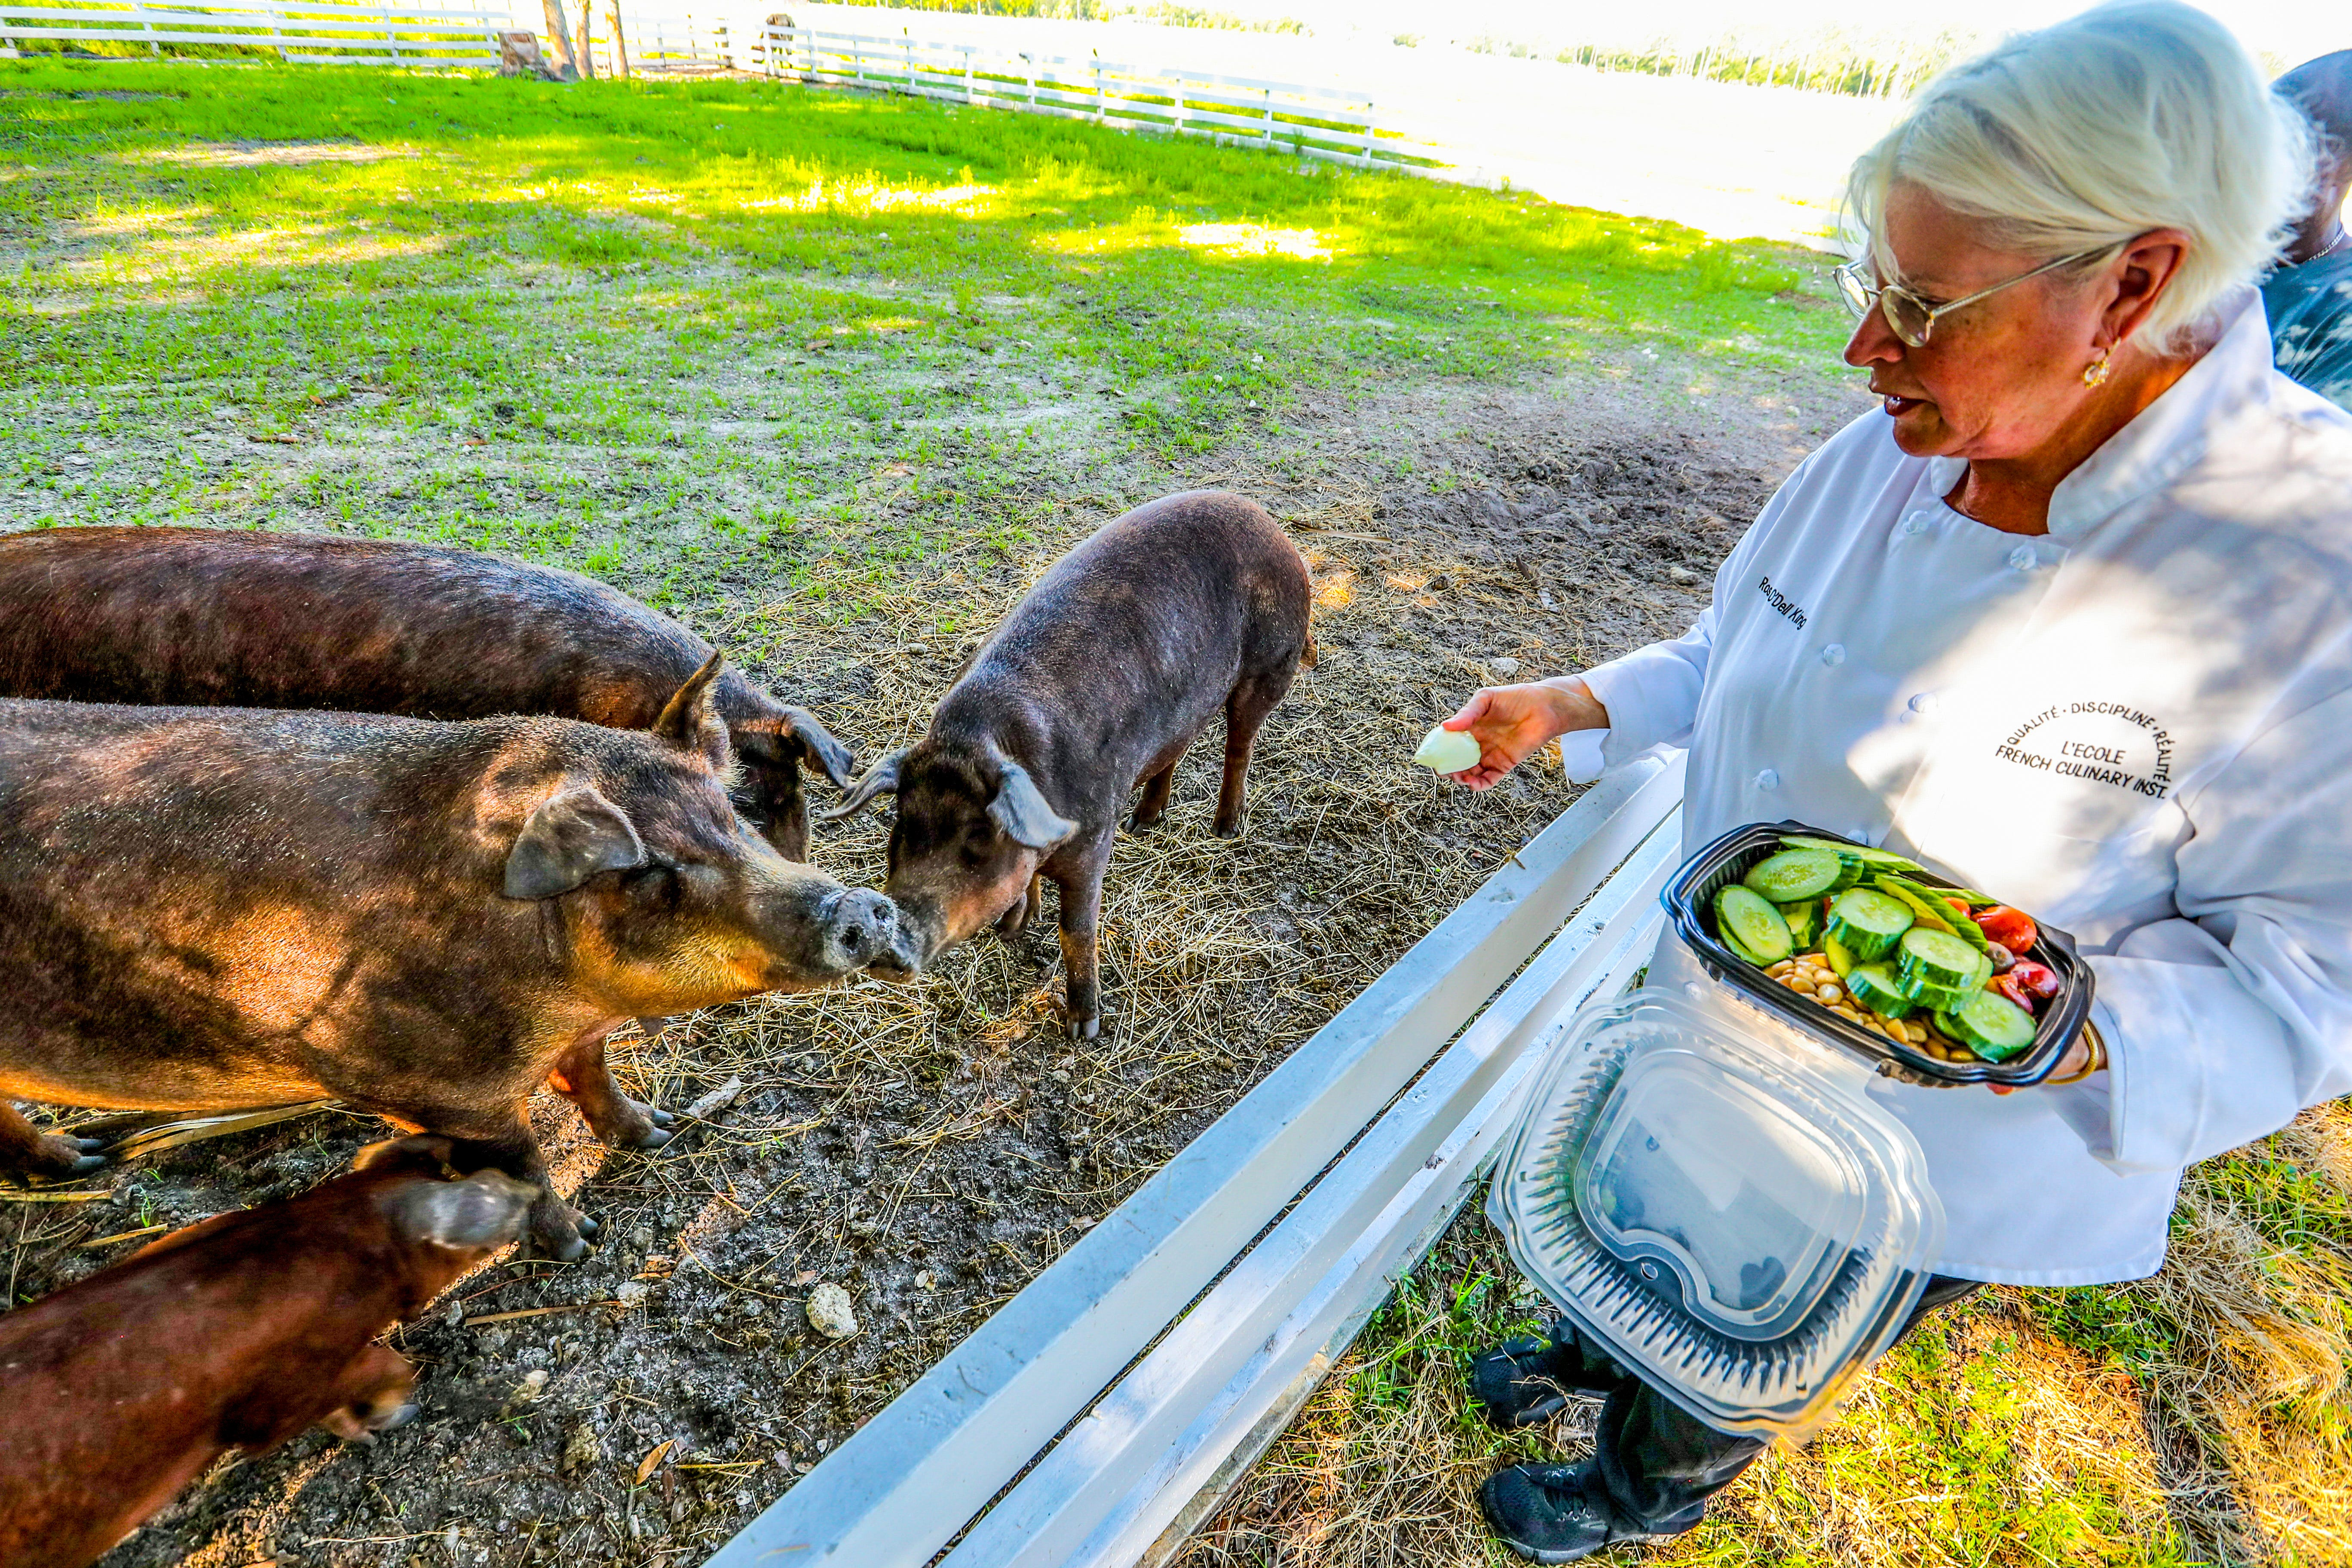 Florida Hog Farmers Hope Covid 19 Exposes Virtues Of Community Farming